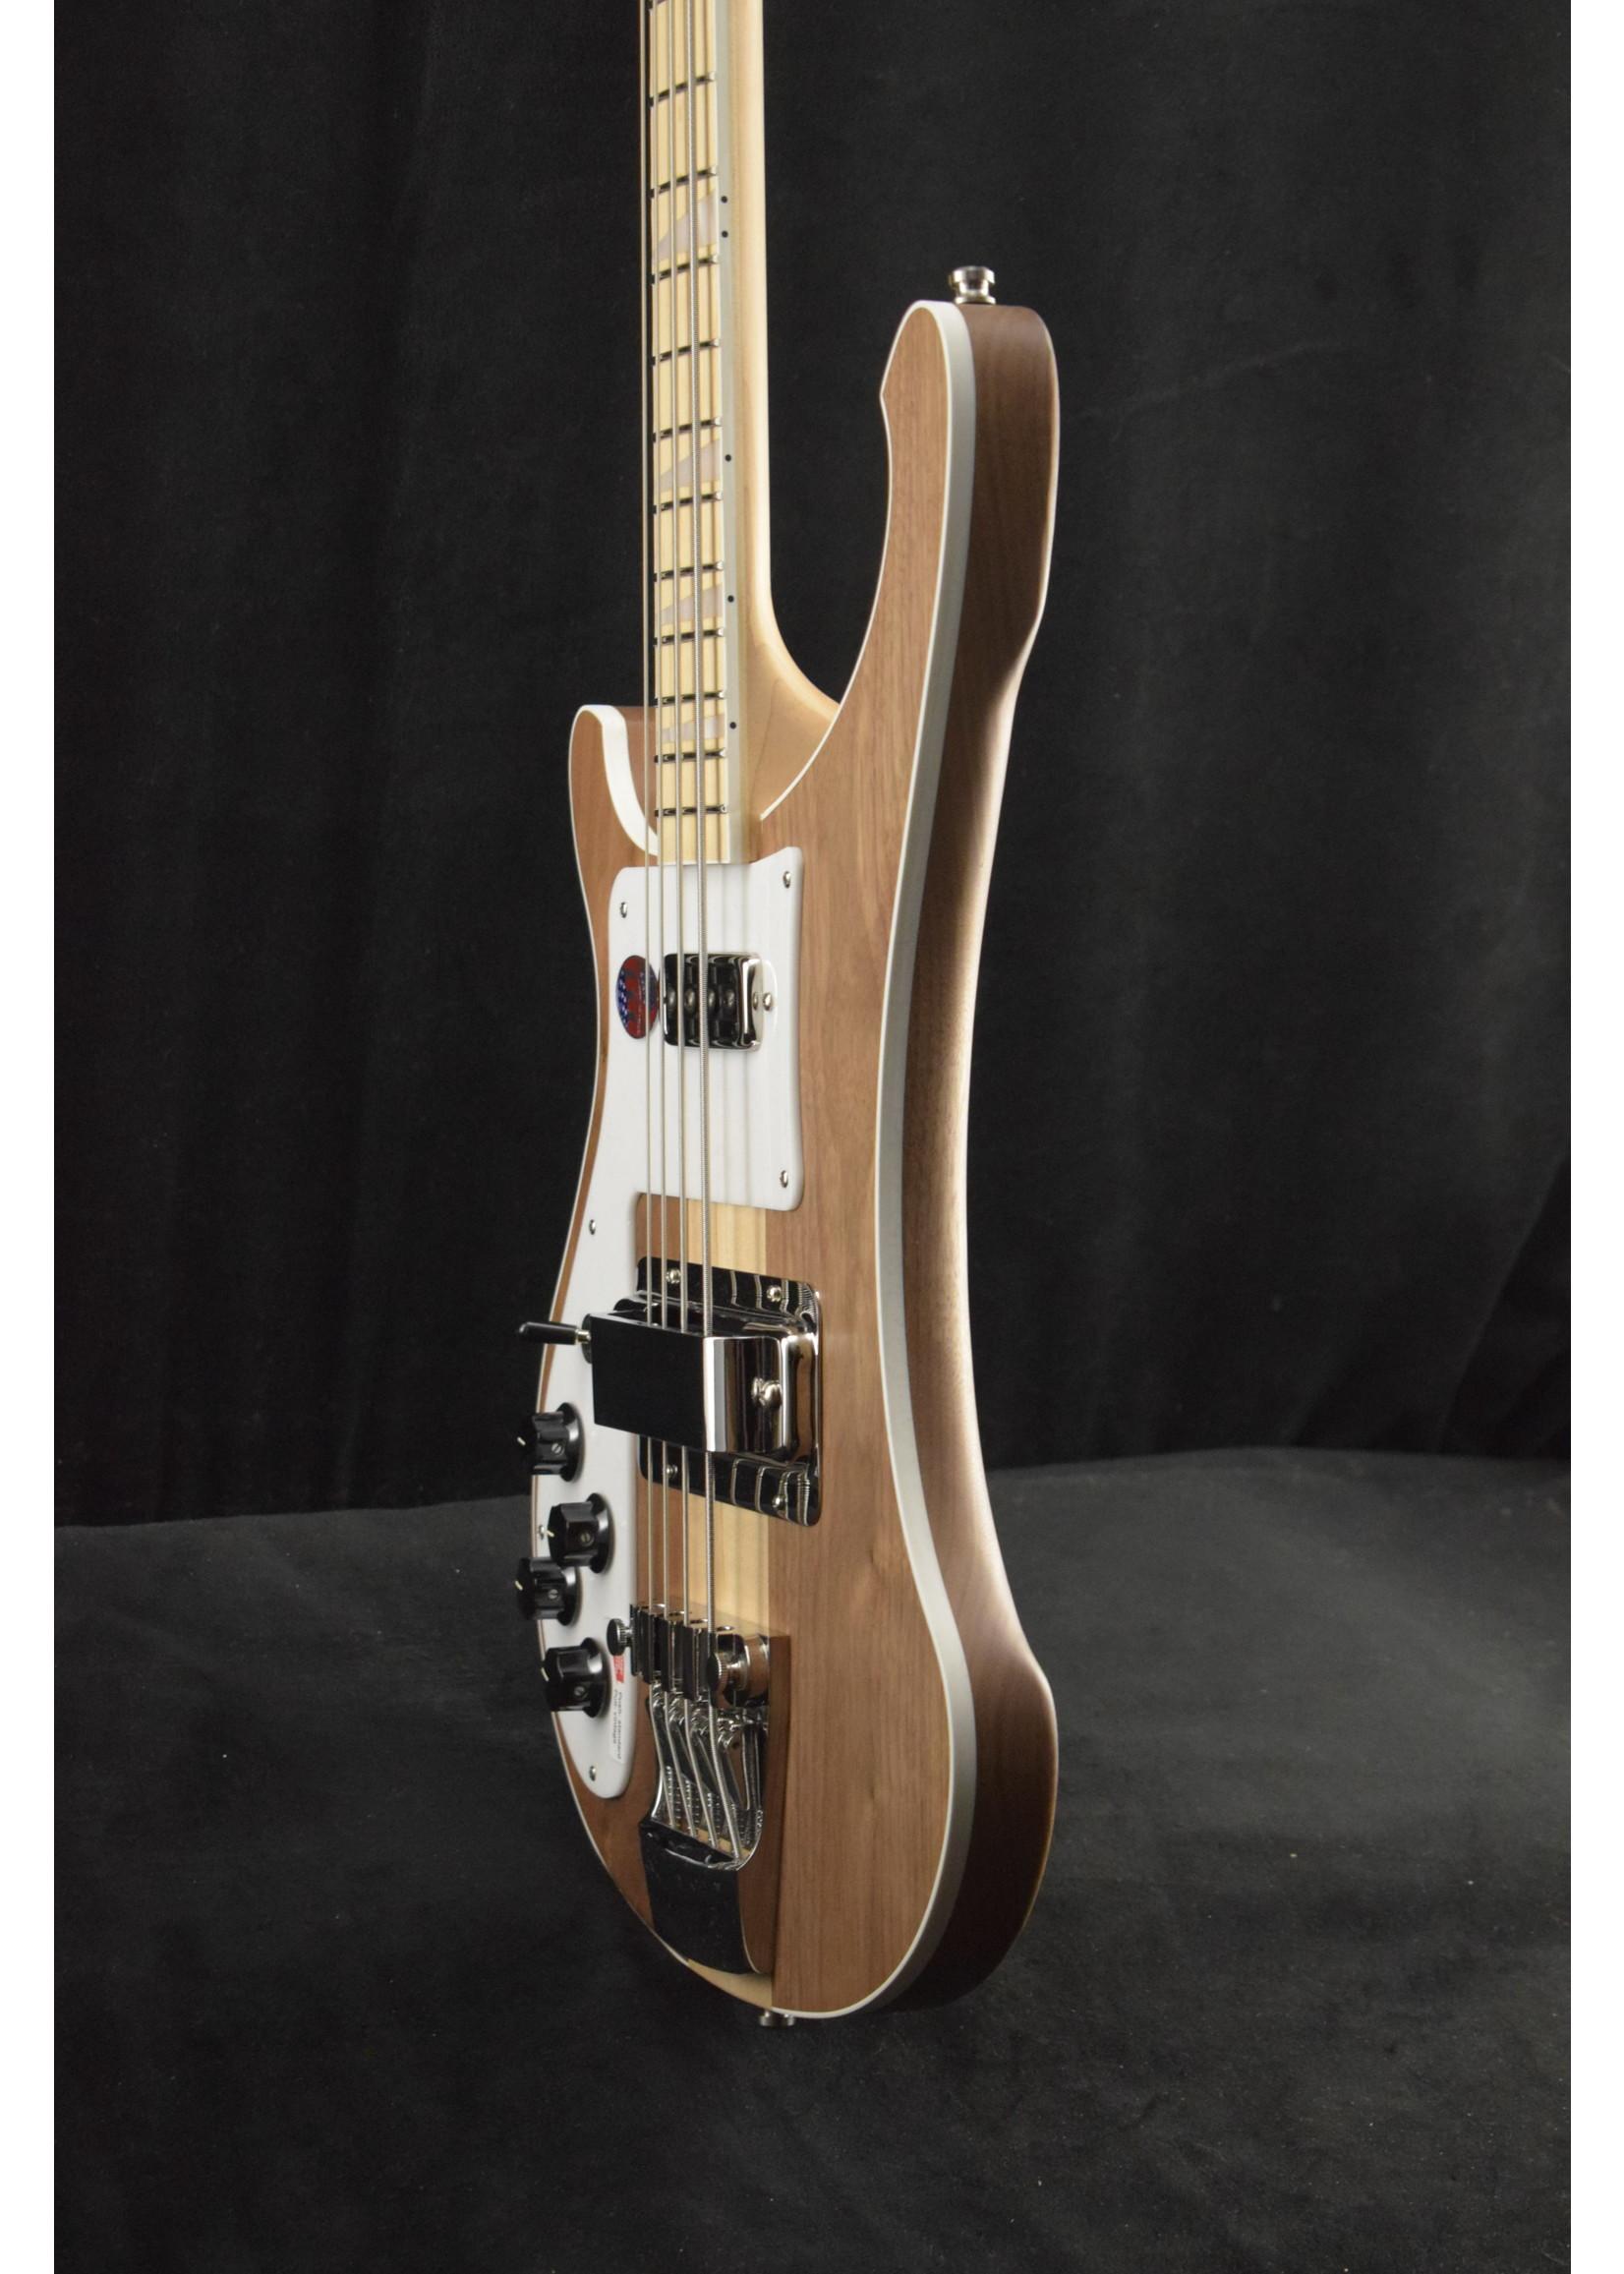 Rickenbacker Rickenbacker 4003W LH Left-Hand Walnut Bass Guitar Natural with Vintage Silver Vinyl Hardshell Case